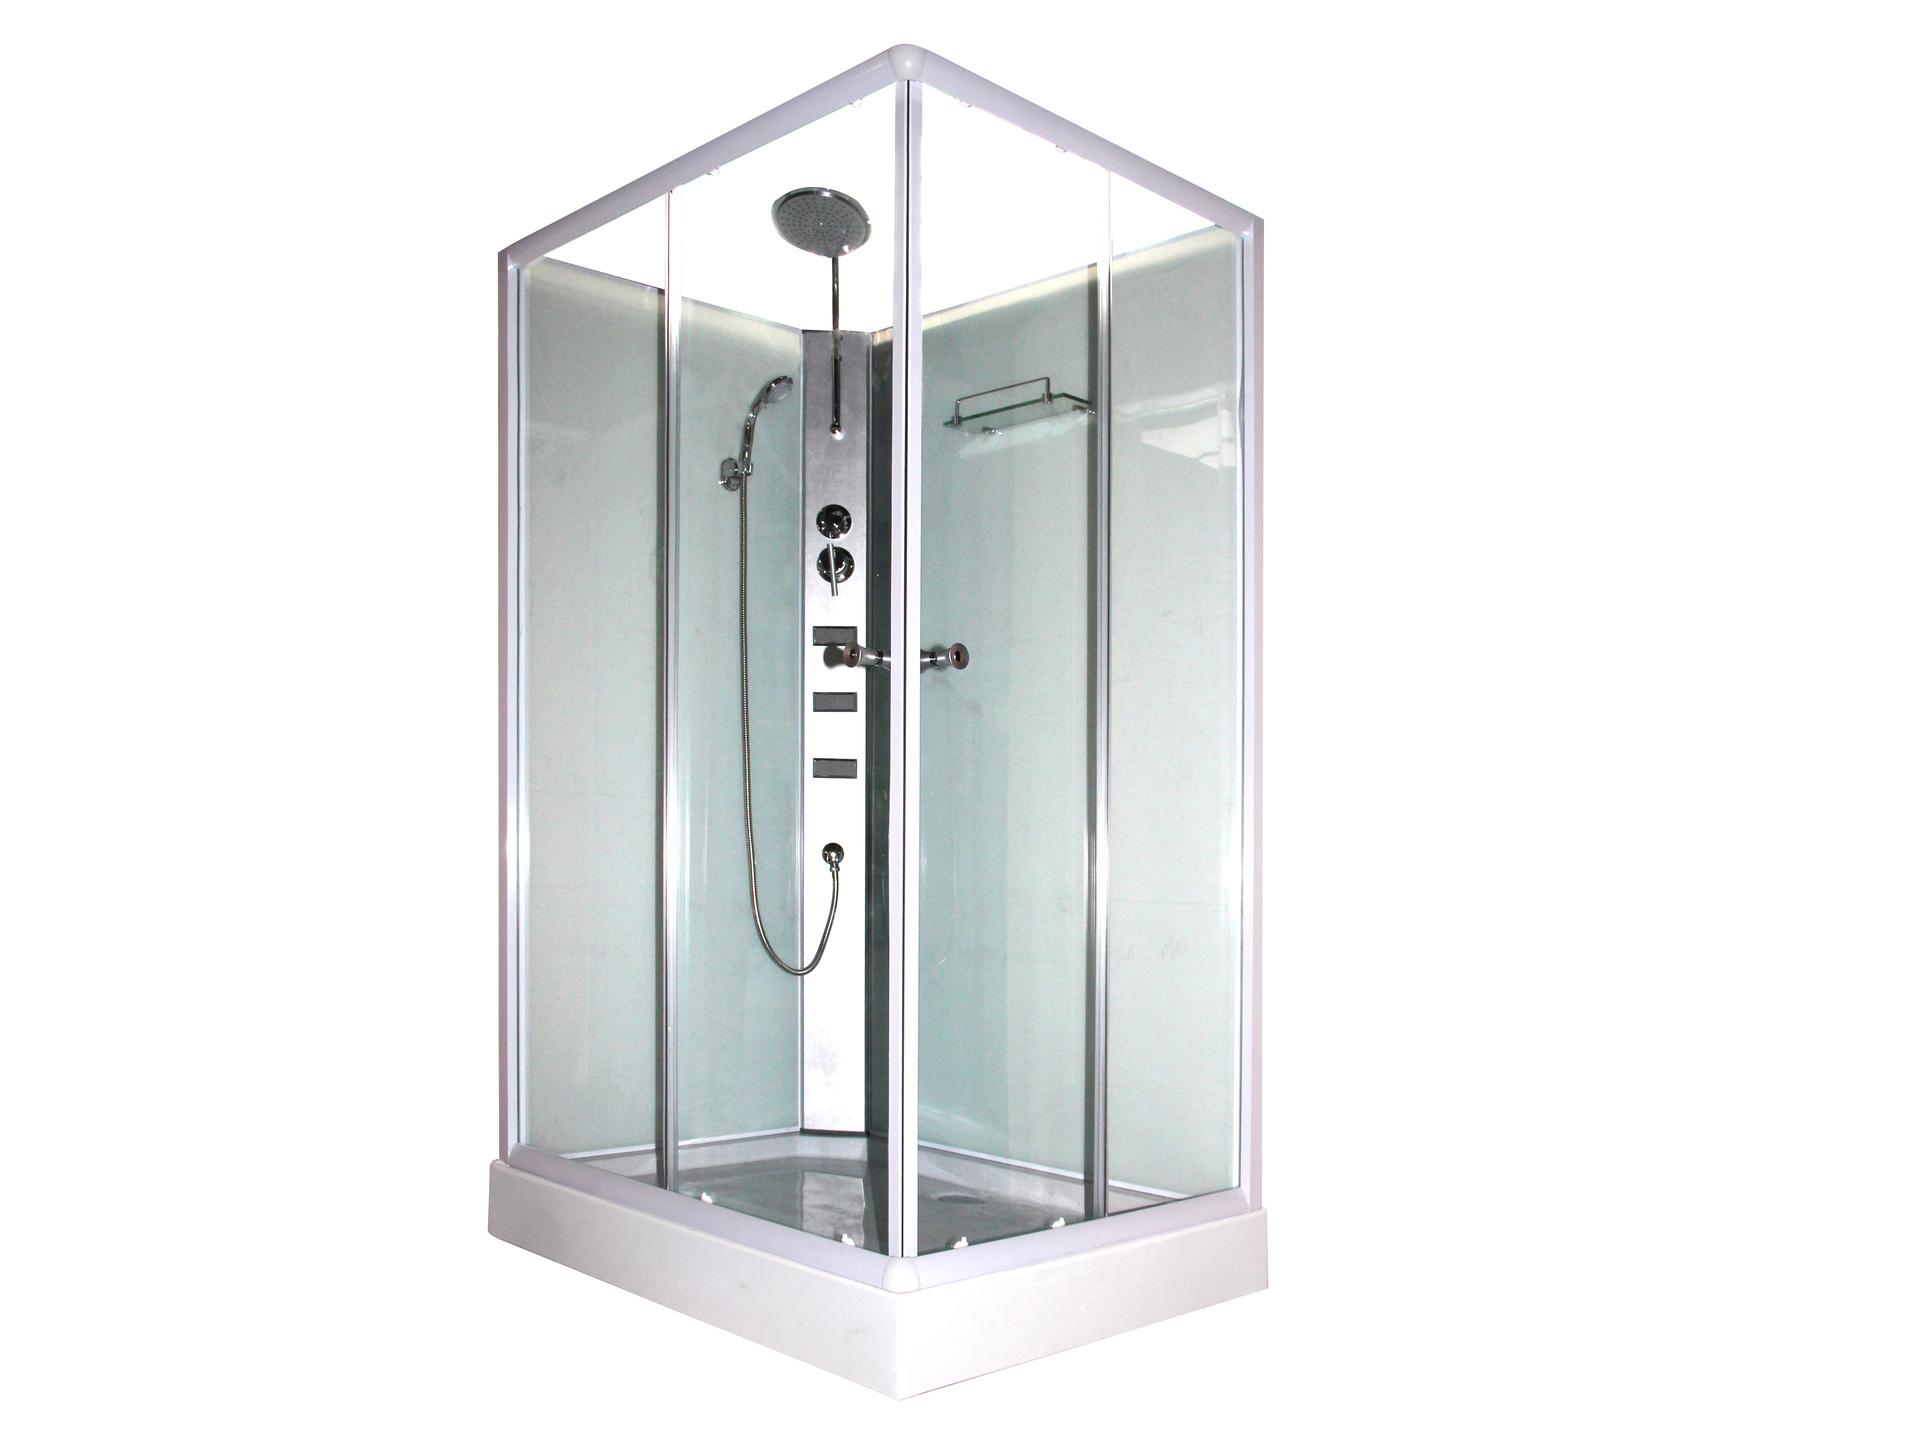 Surprenant porte de douche pliante renaa conception for Porte de douche pliante 90 cm